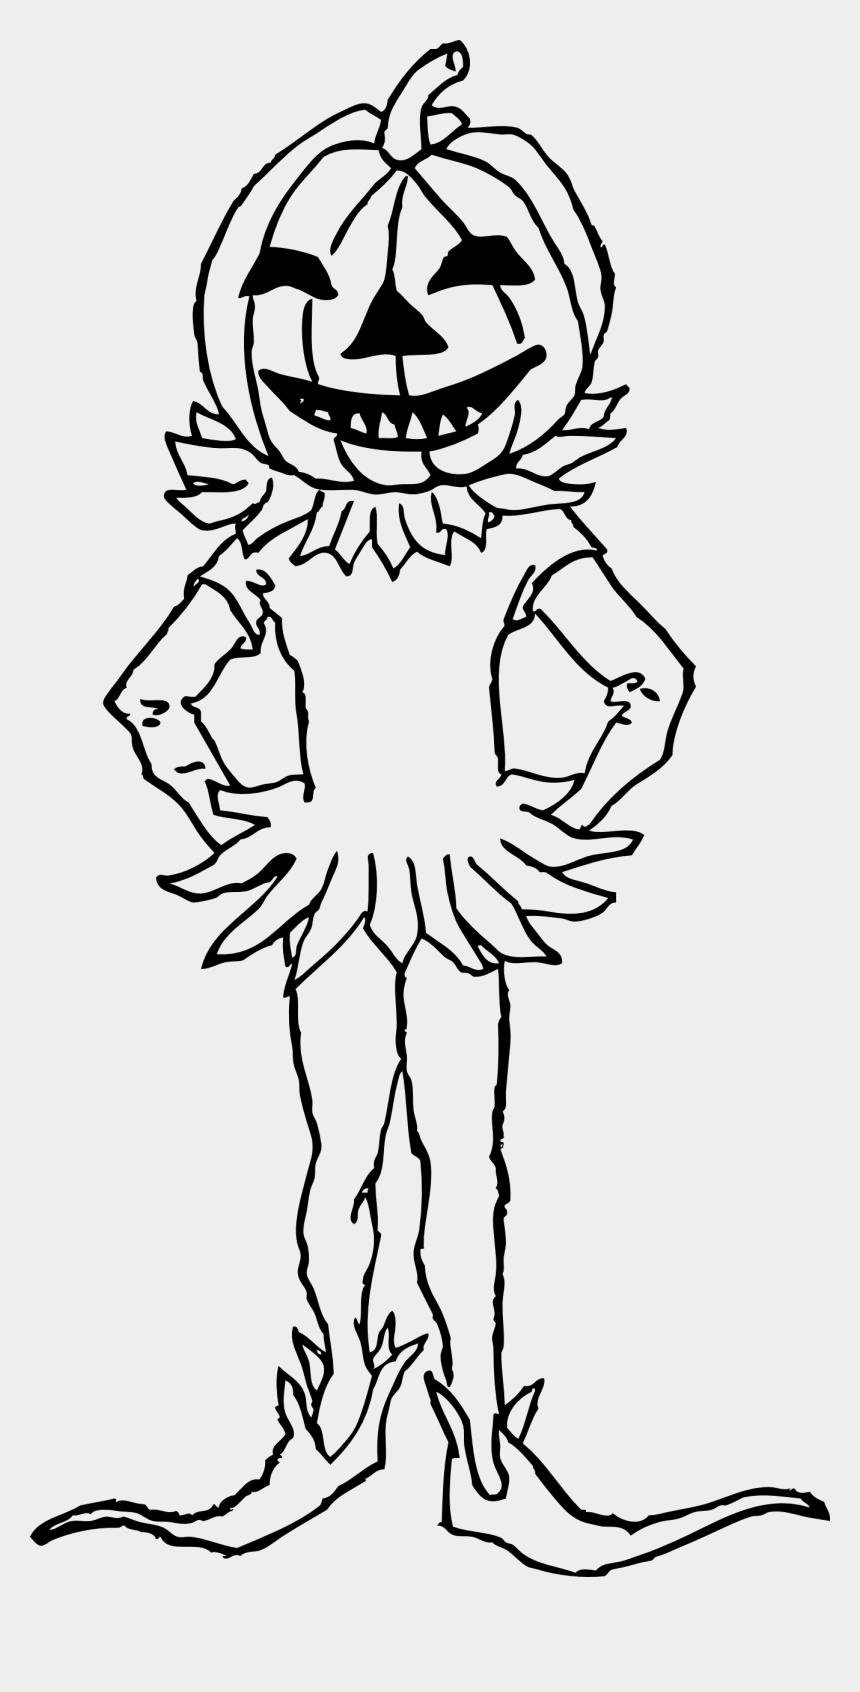 pumpkin clipart black and white, Cartoons - Pumpkin Black And White Boy With Pumpkin Clipart Black - Costumes In Halloween Clipart Black And White